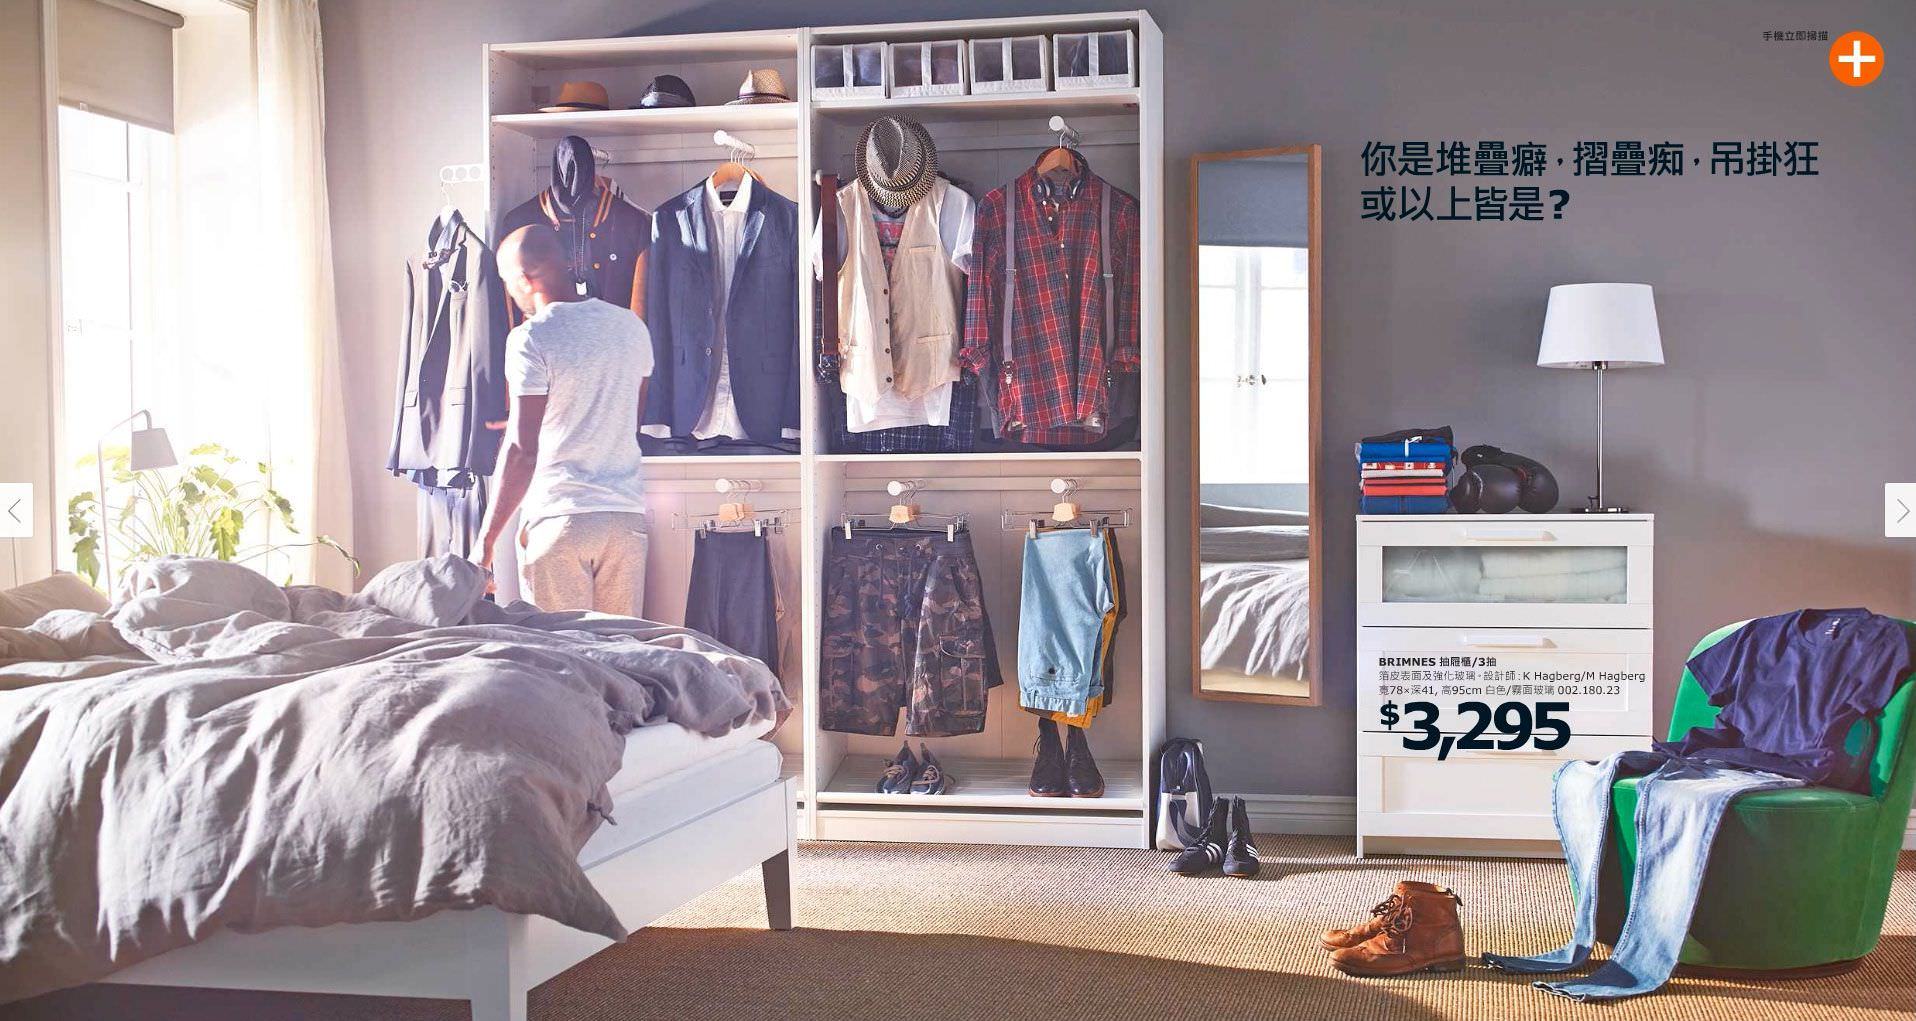 IKEA 如何打造內容王國?一窺他們民國 40 年就在做的事